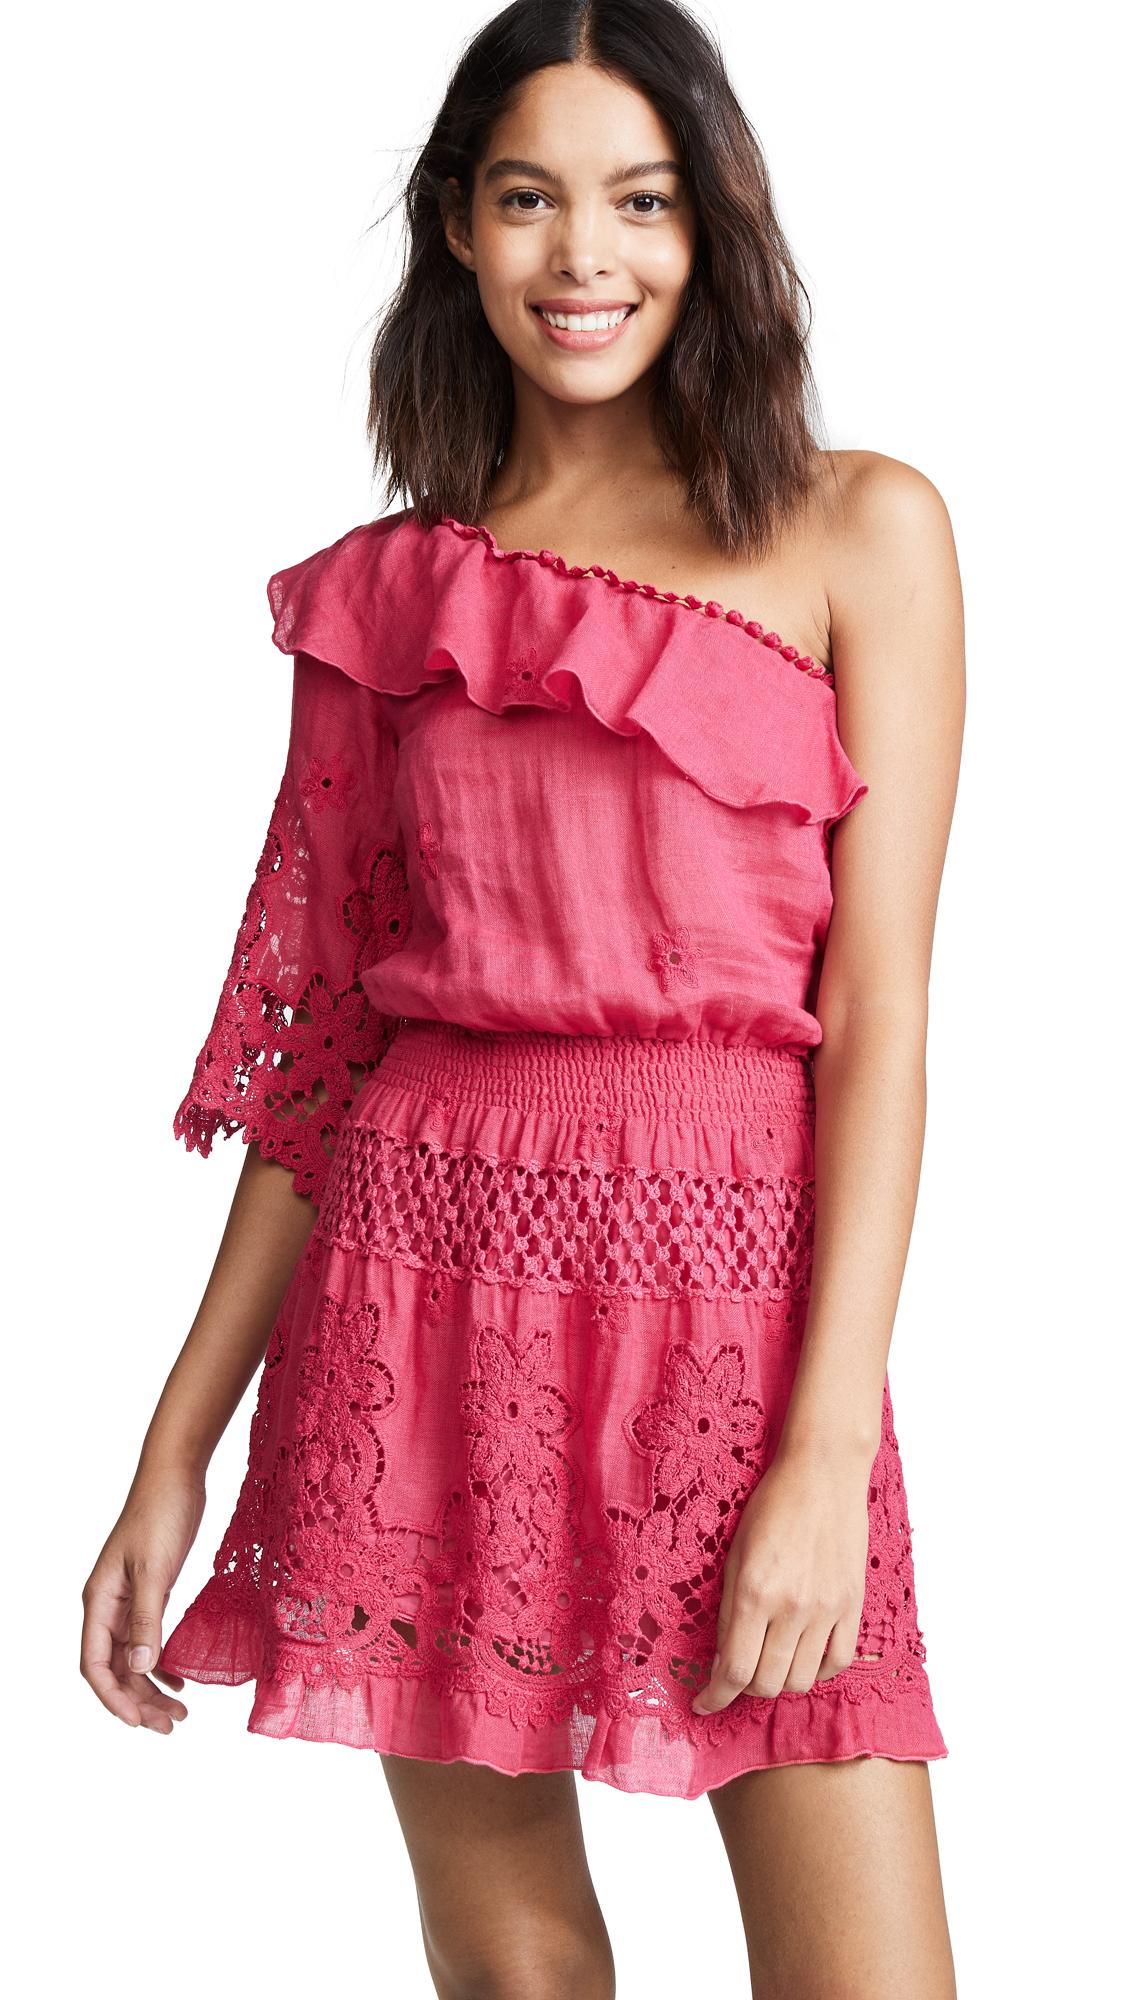 Temptation Positano Bali One Shoulder Short Dress - Cherry Red